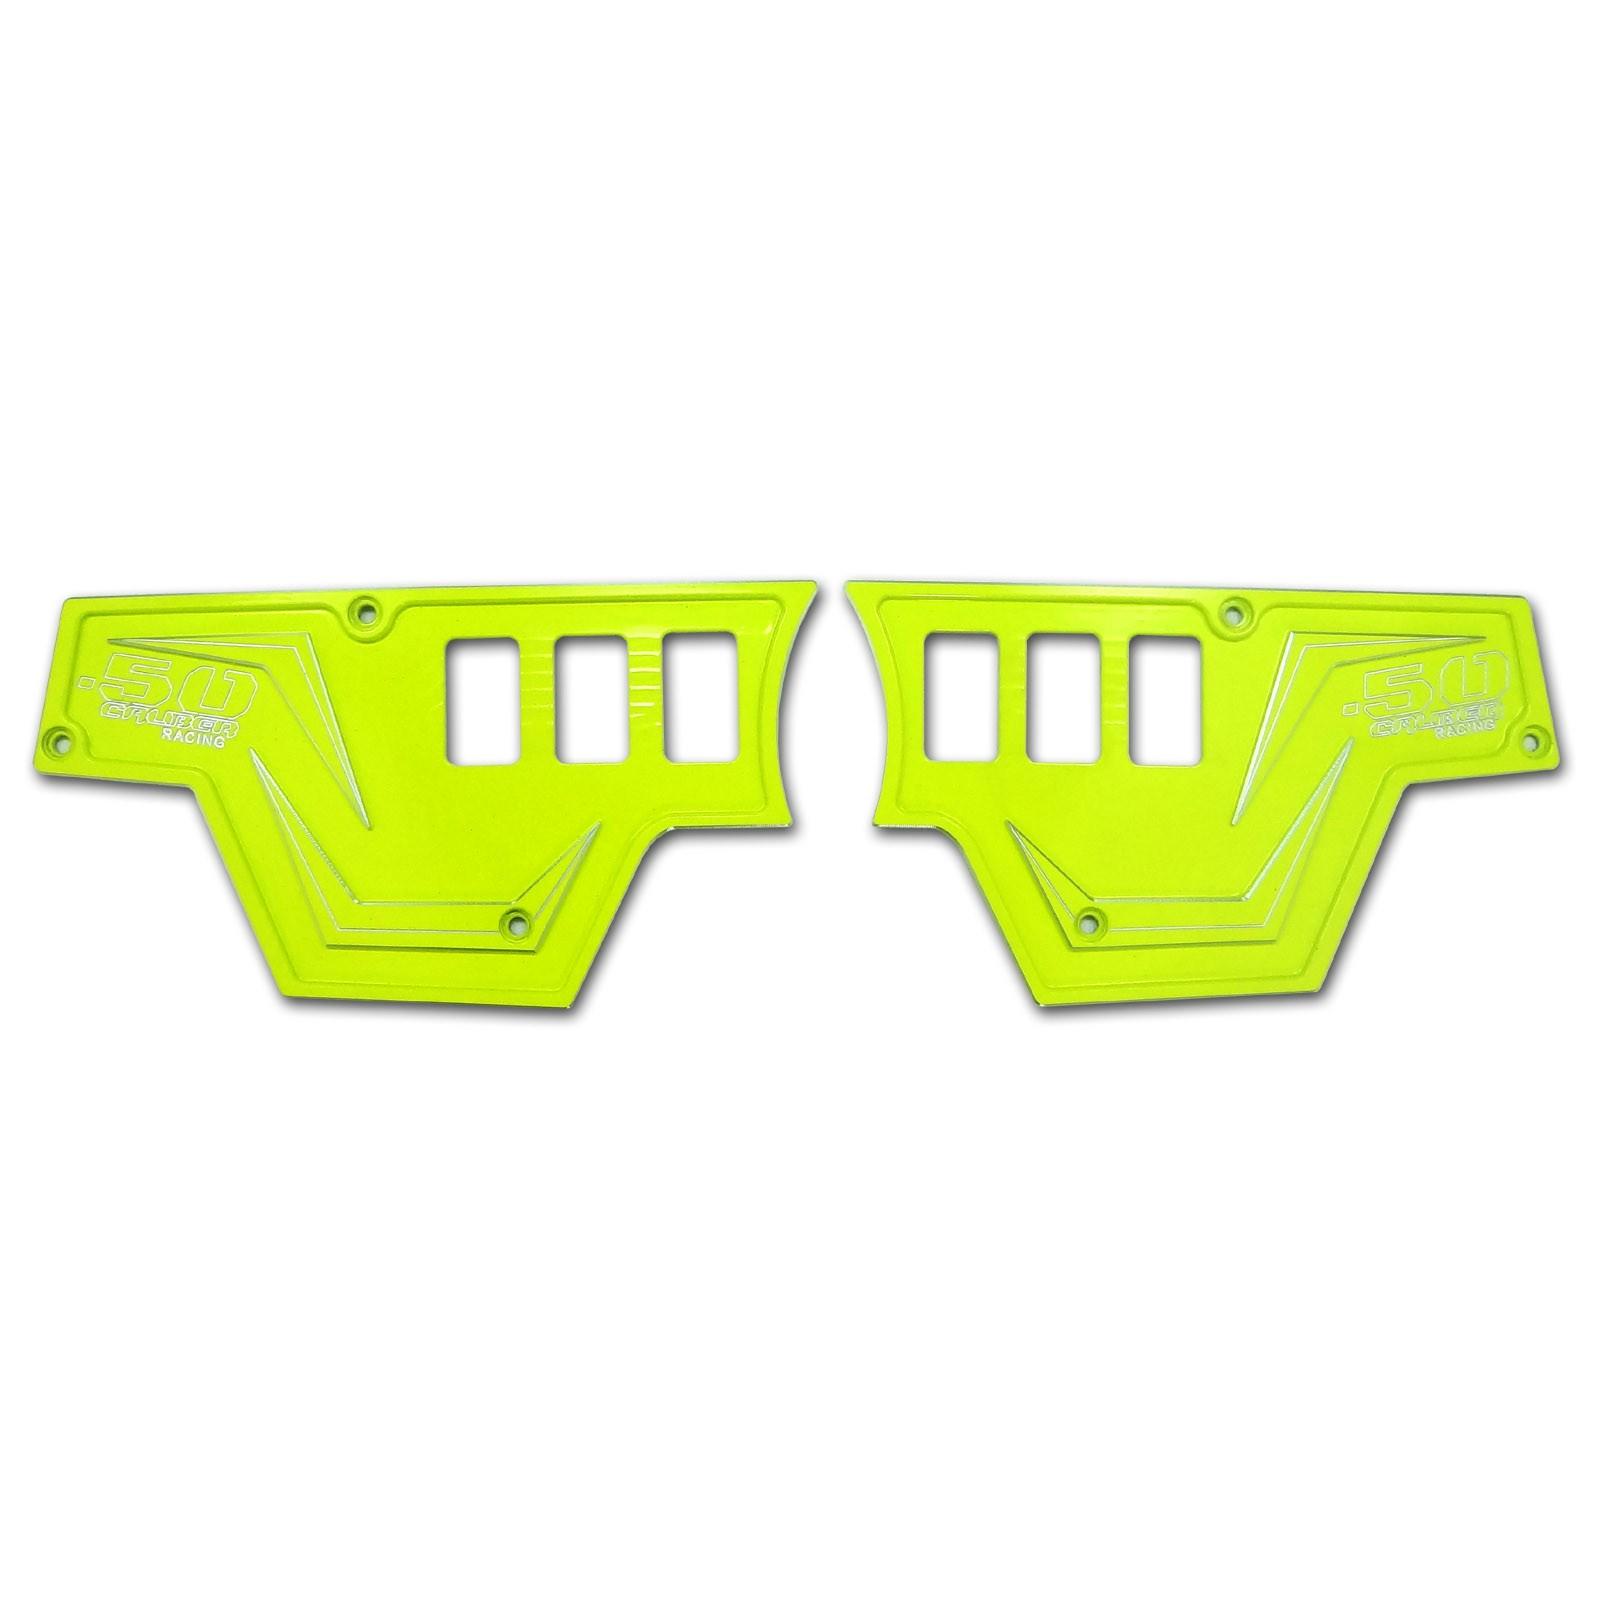 Polaris RZR Lime Dash Switch Panel for RZR 900 2015-2018